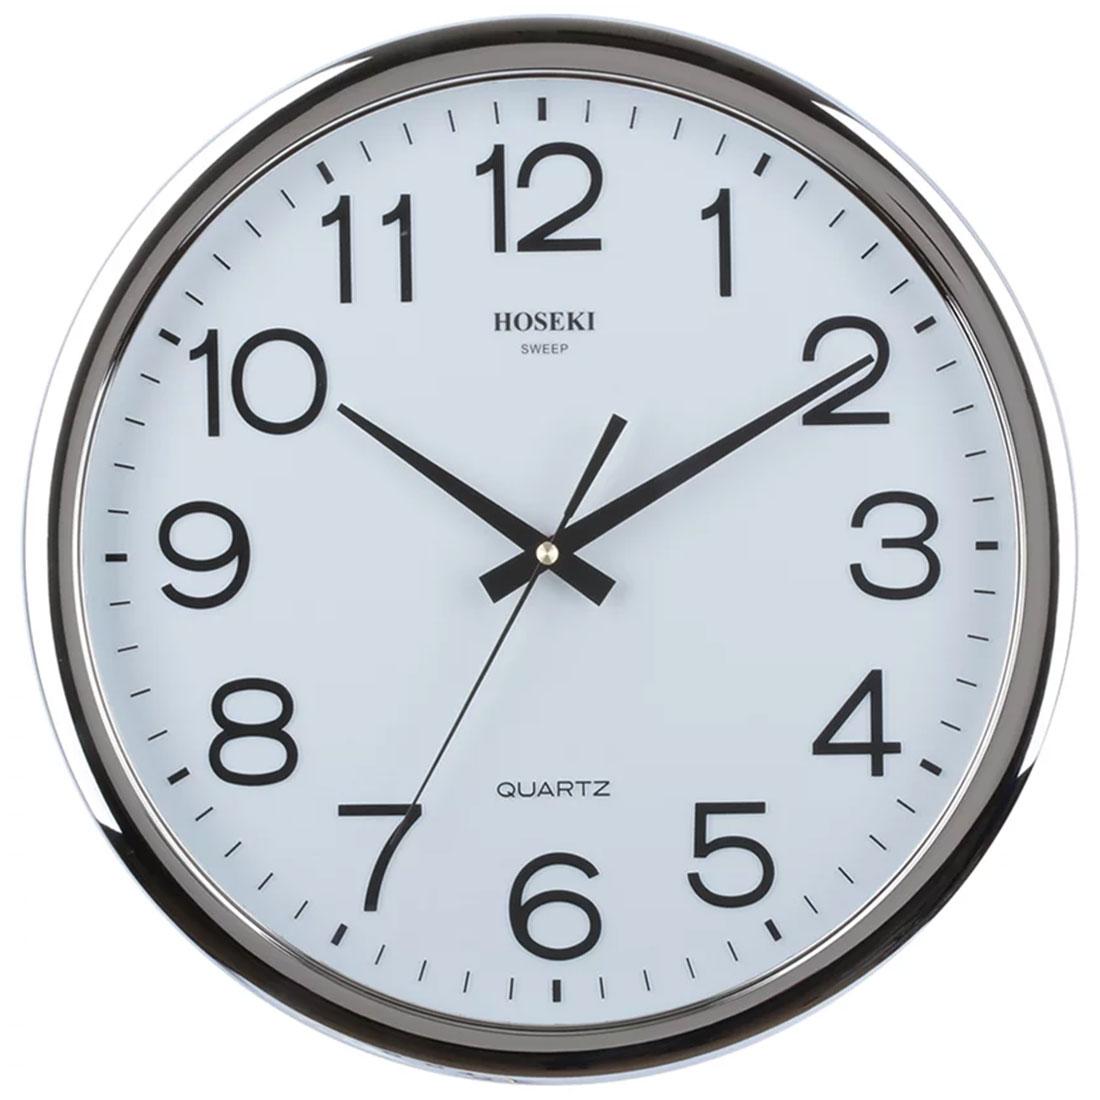 Hoseki Quartz H-9407S H-9407 Silver Sweep Round Decor Wall Clock